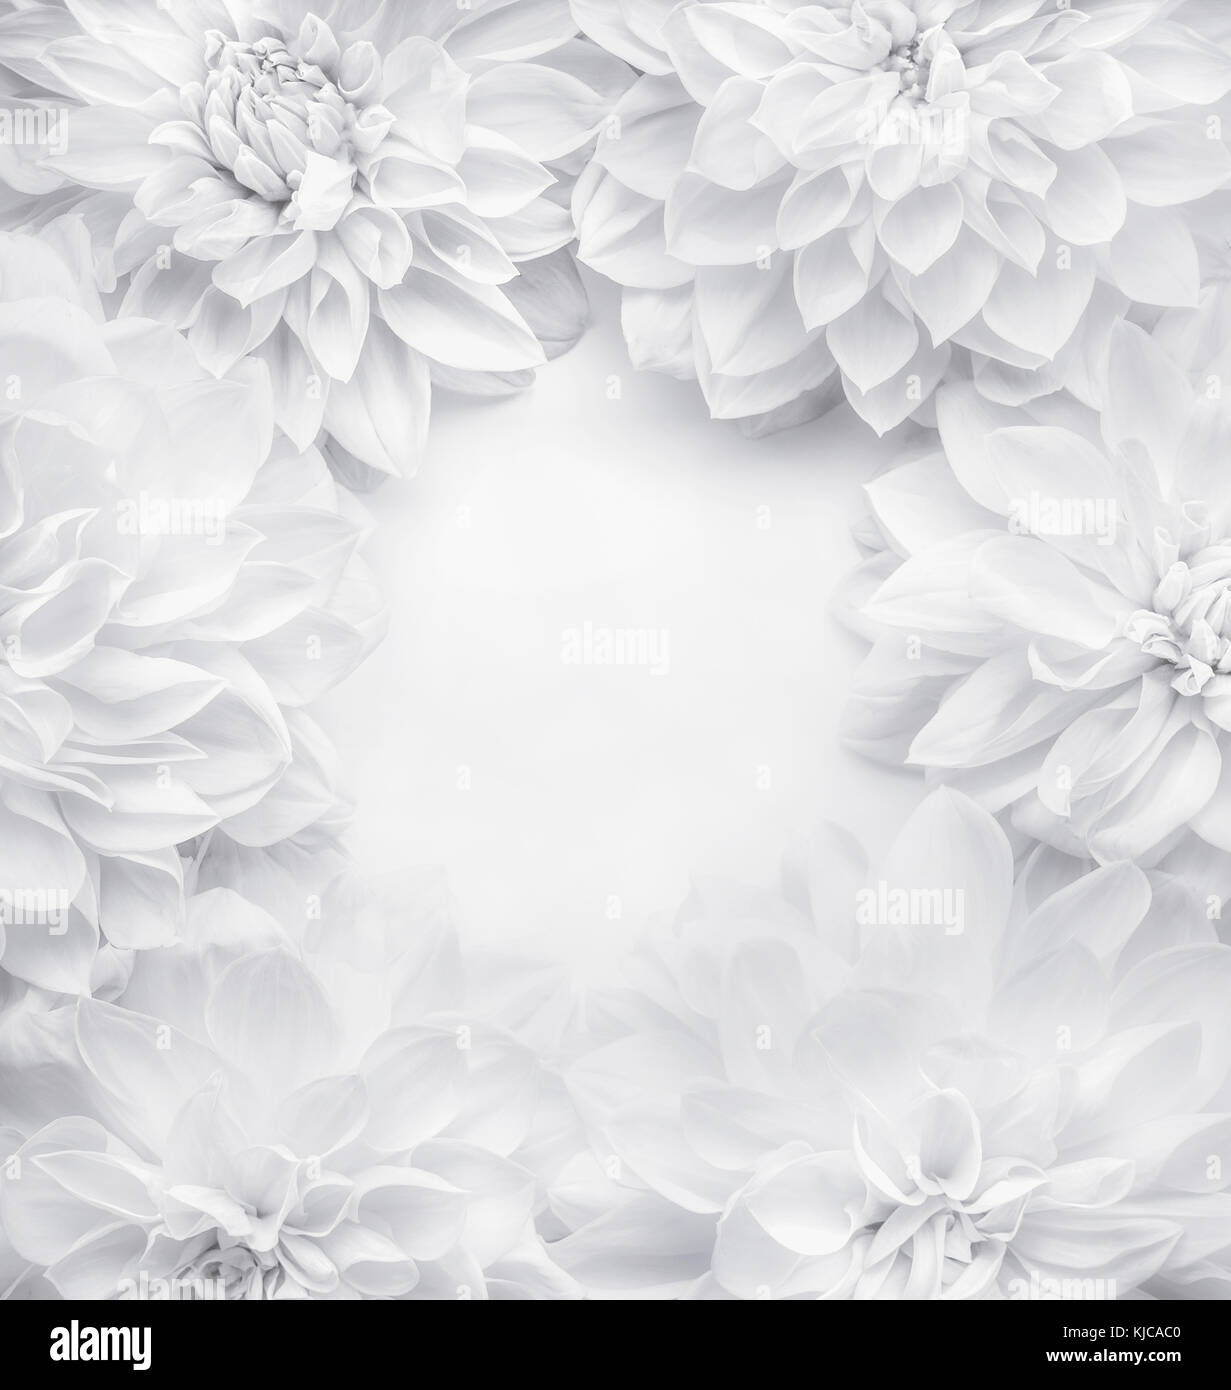 Fondo de marco flores blancas creativas , patrón floral o diseño de ...